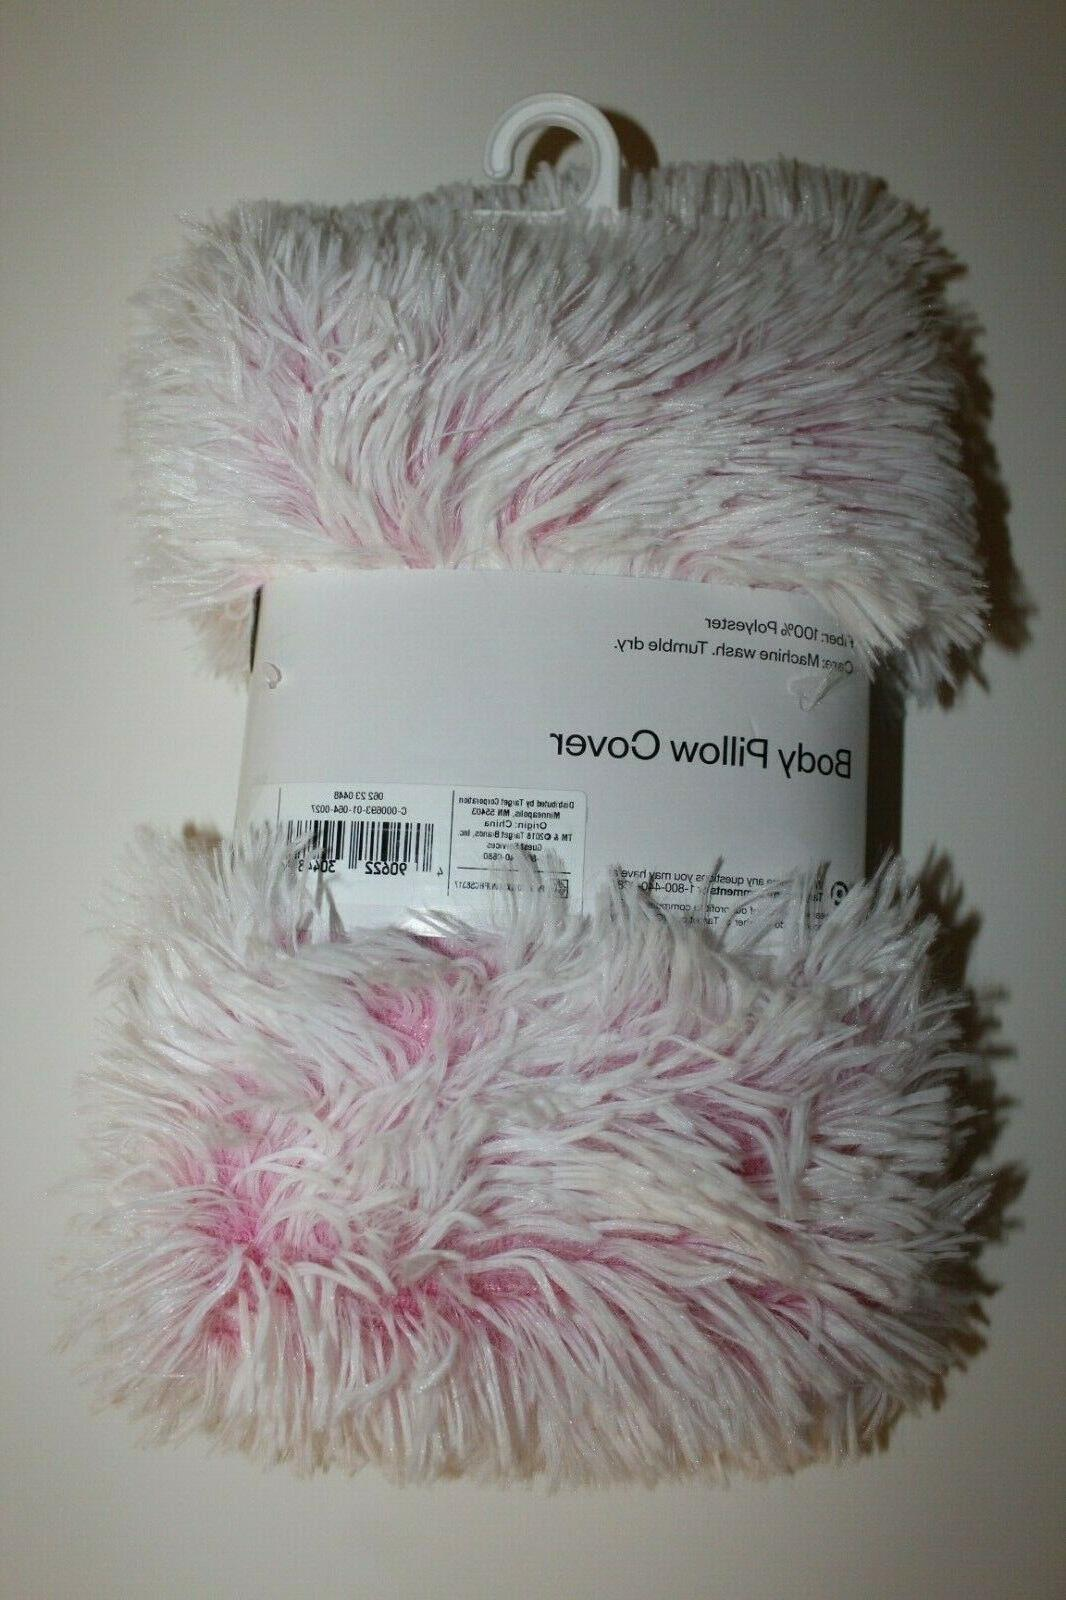 NEW Body White Soft Fur Pillowcase